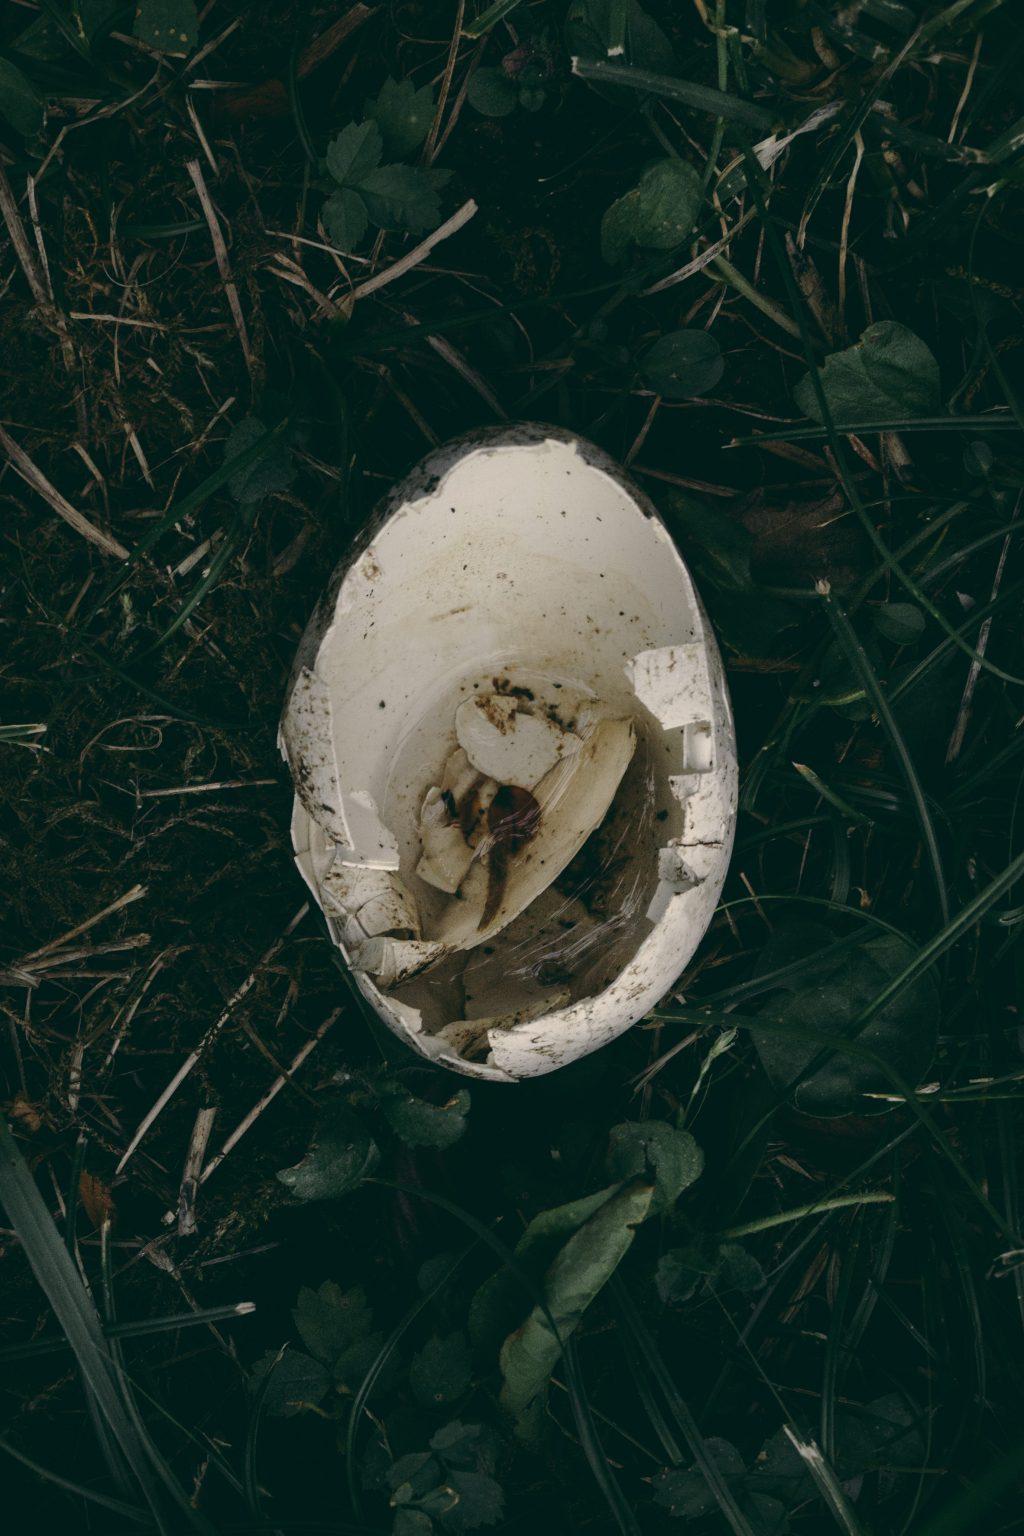 Bonneuil-Matours, France, May 2017 - La Maison Neuve. One of the unfertilised eggs of the white stork Mildred, fallen from her nest. >< Bonneuil-Matours, Francia, maggio 2017 -  La Maison Neuve. Una delle uova non fecondate della cicogna bianca Mildred, caduta dal nido.*** SPECIAL   FEE   APPLIES ***